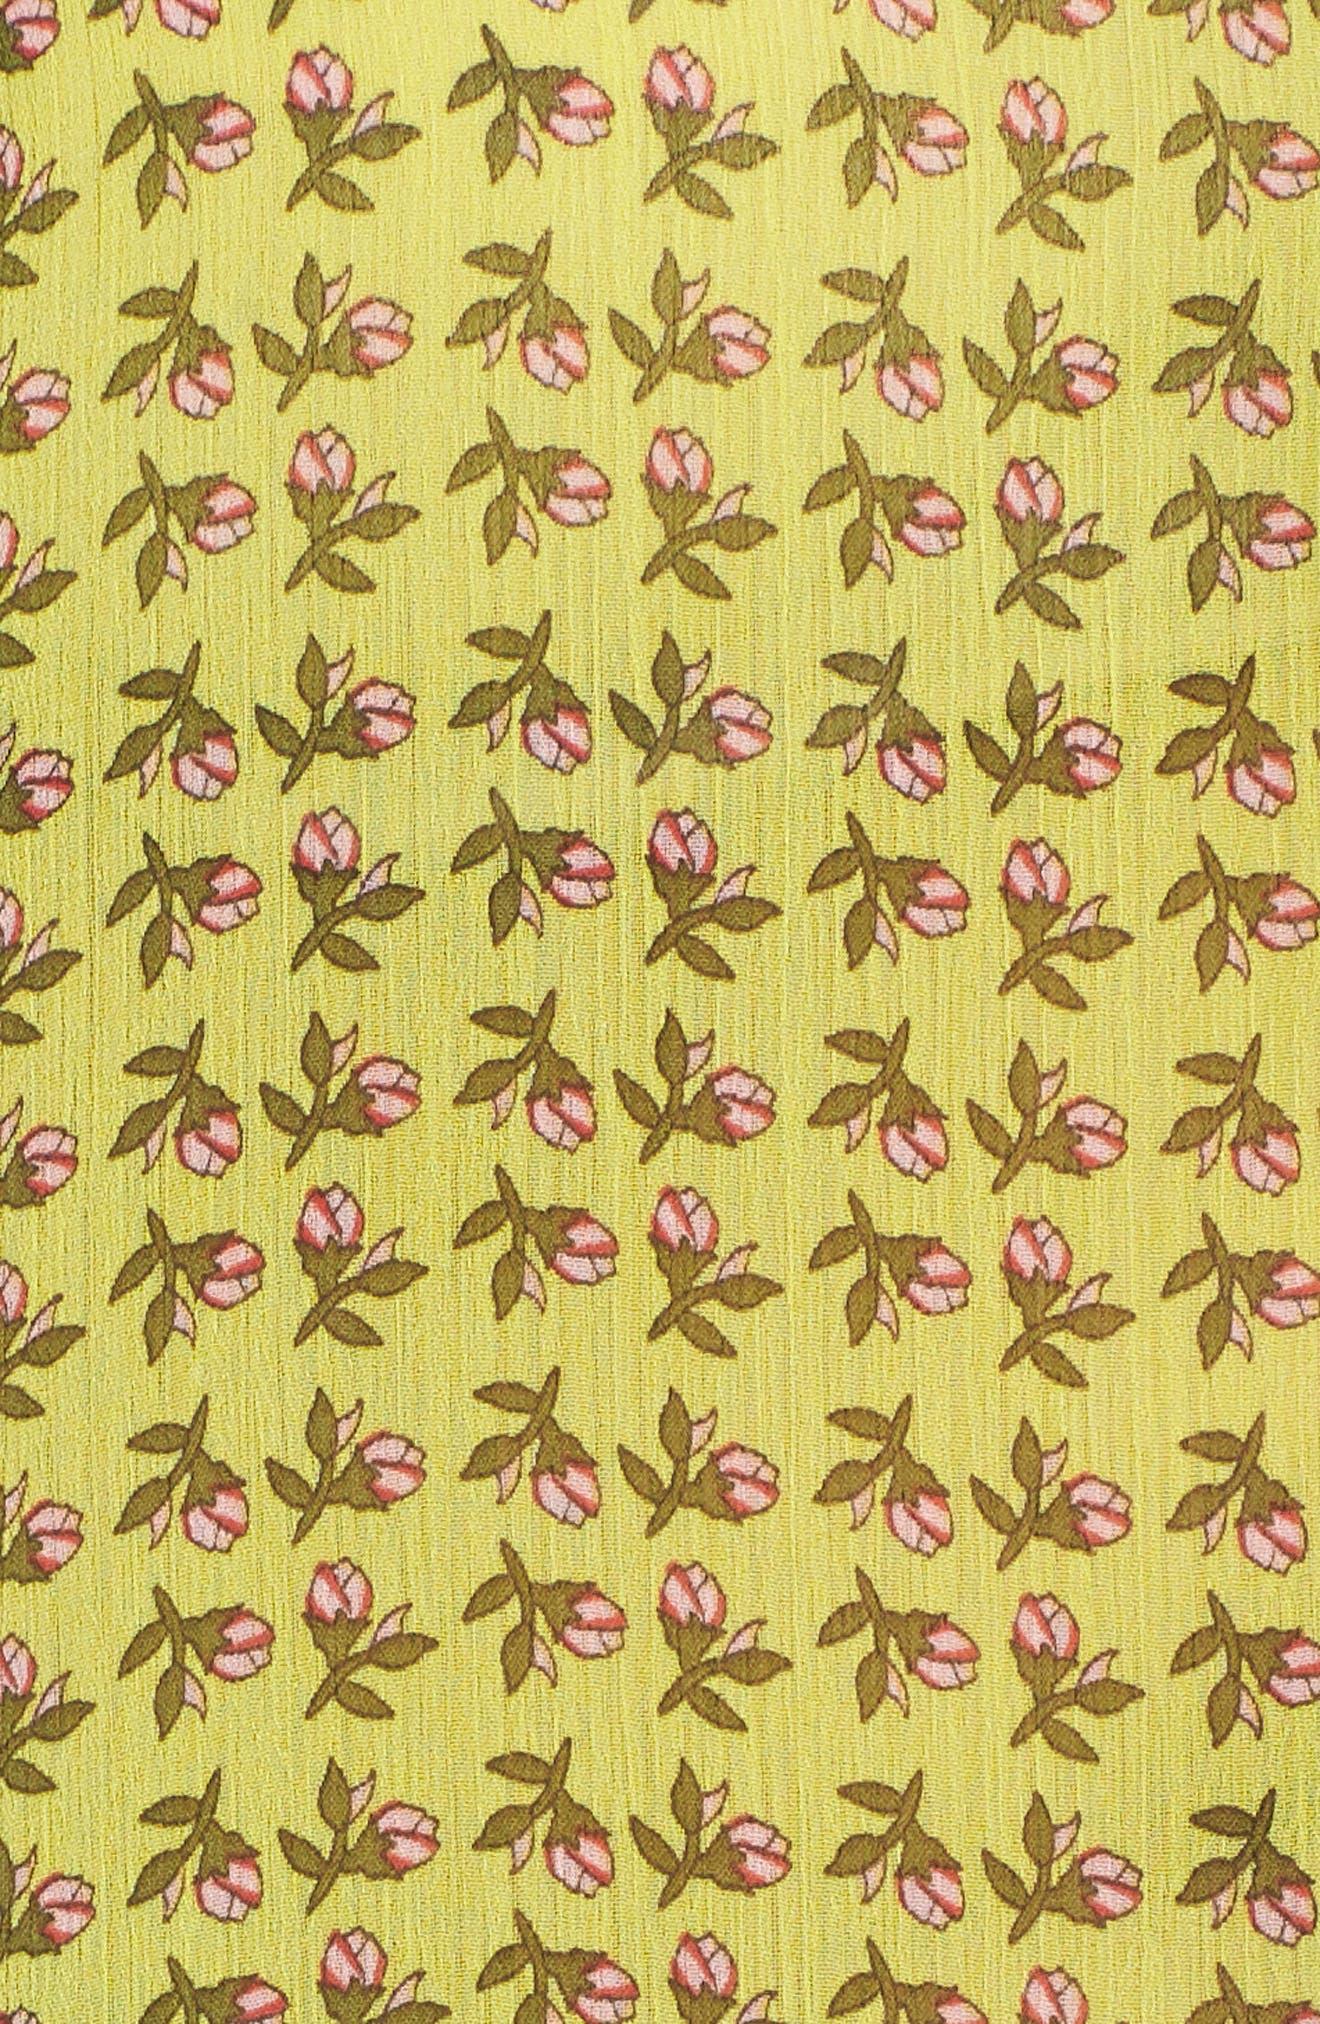 Jasmine Floral Roll Sleeve Top,                             Alternate thumbnail 6, color,                             702